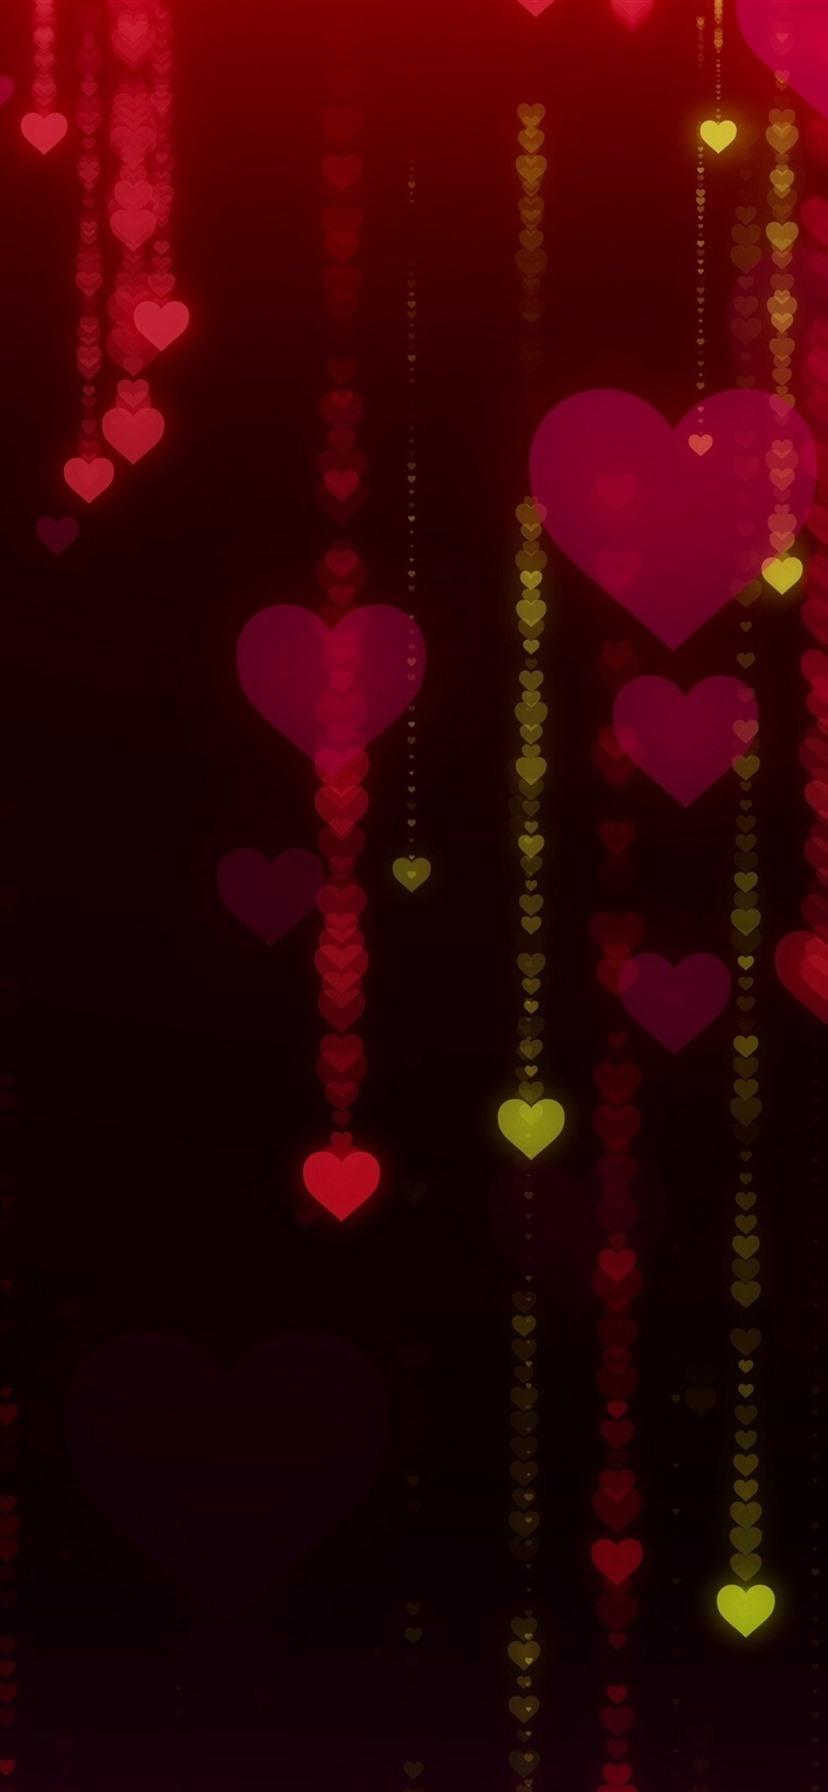 Love Hearts Glare Black Background 1080x1920 Iphone 8 7 6